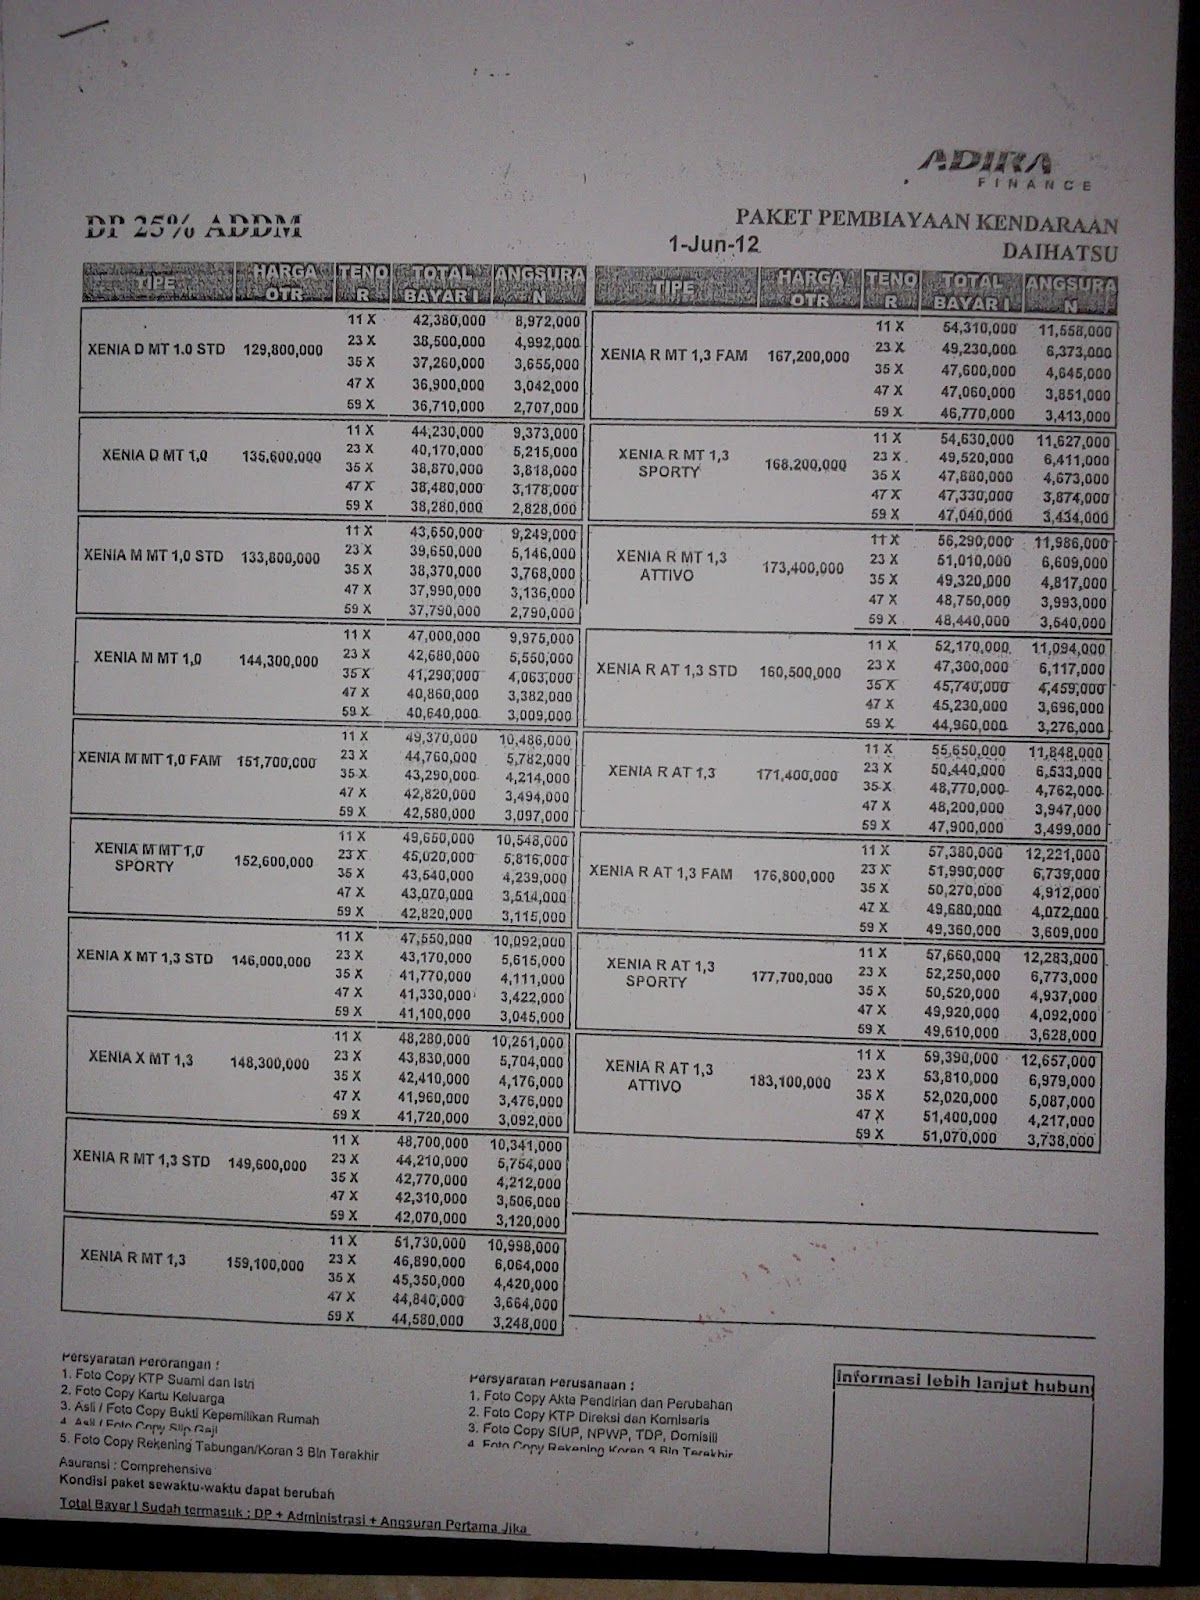 Paket Kredit Daihatsu Surabaya By Adira